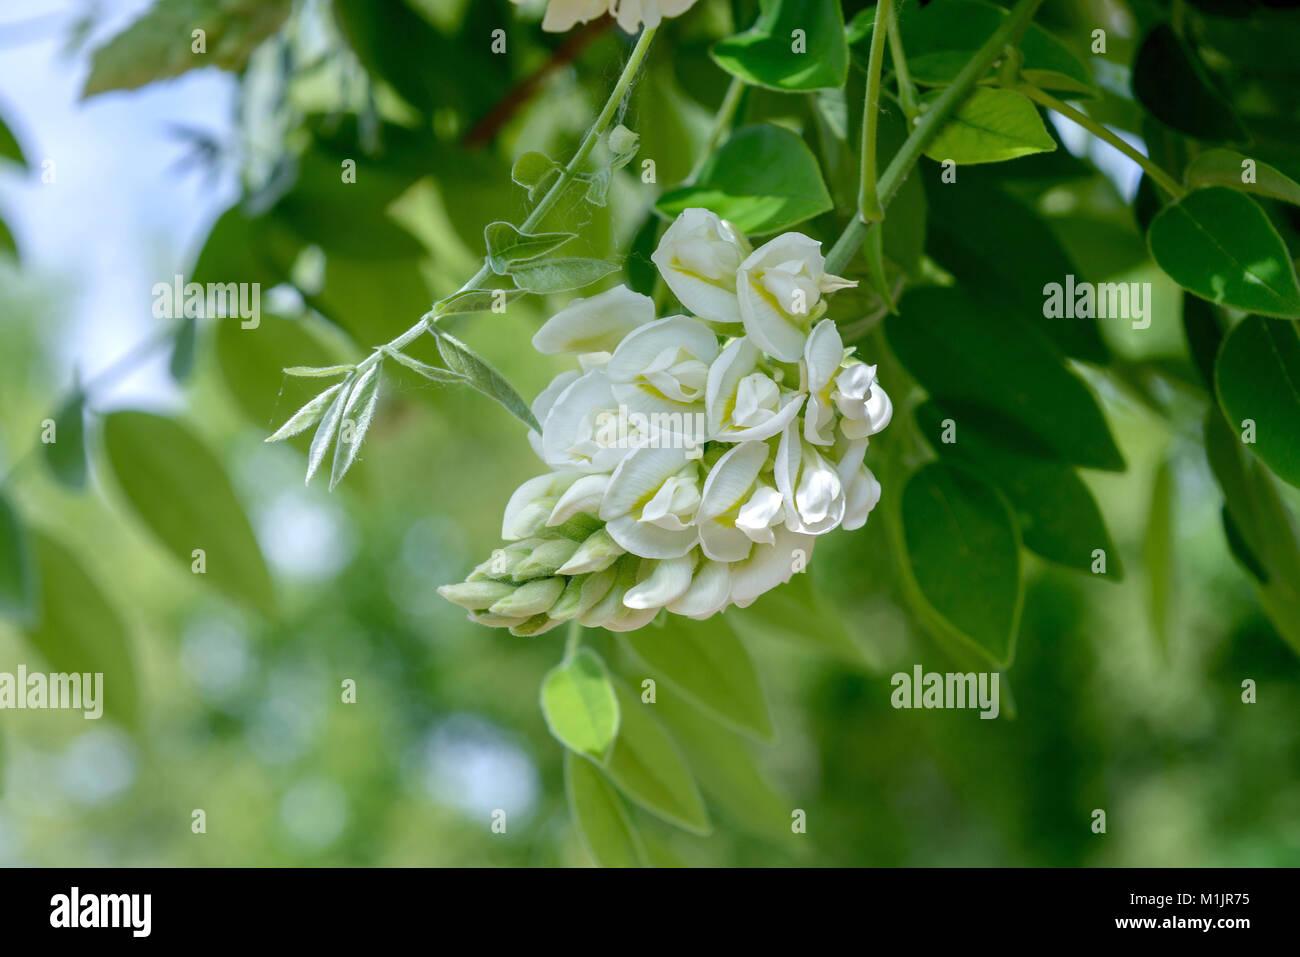 Chinese Blue Rain (Wisteria sinensis Nivea), Chinesischer Blauregen (Wisteria sinensis Nivea) - Stock Image